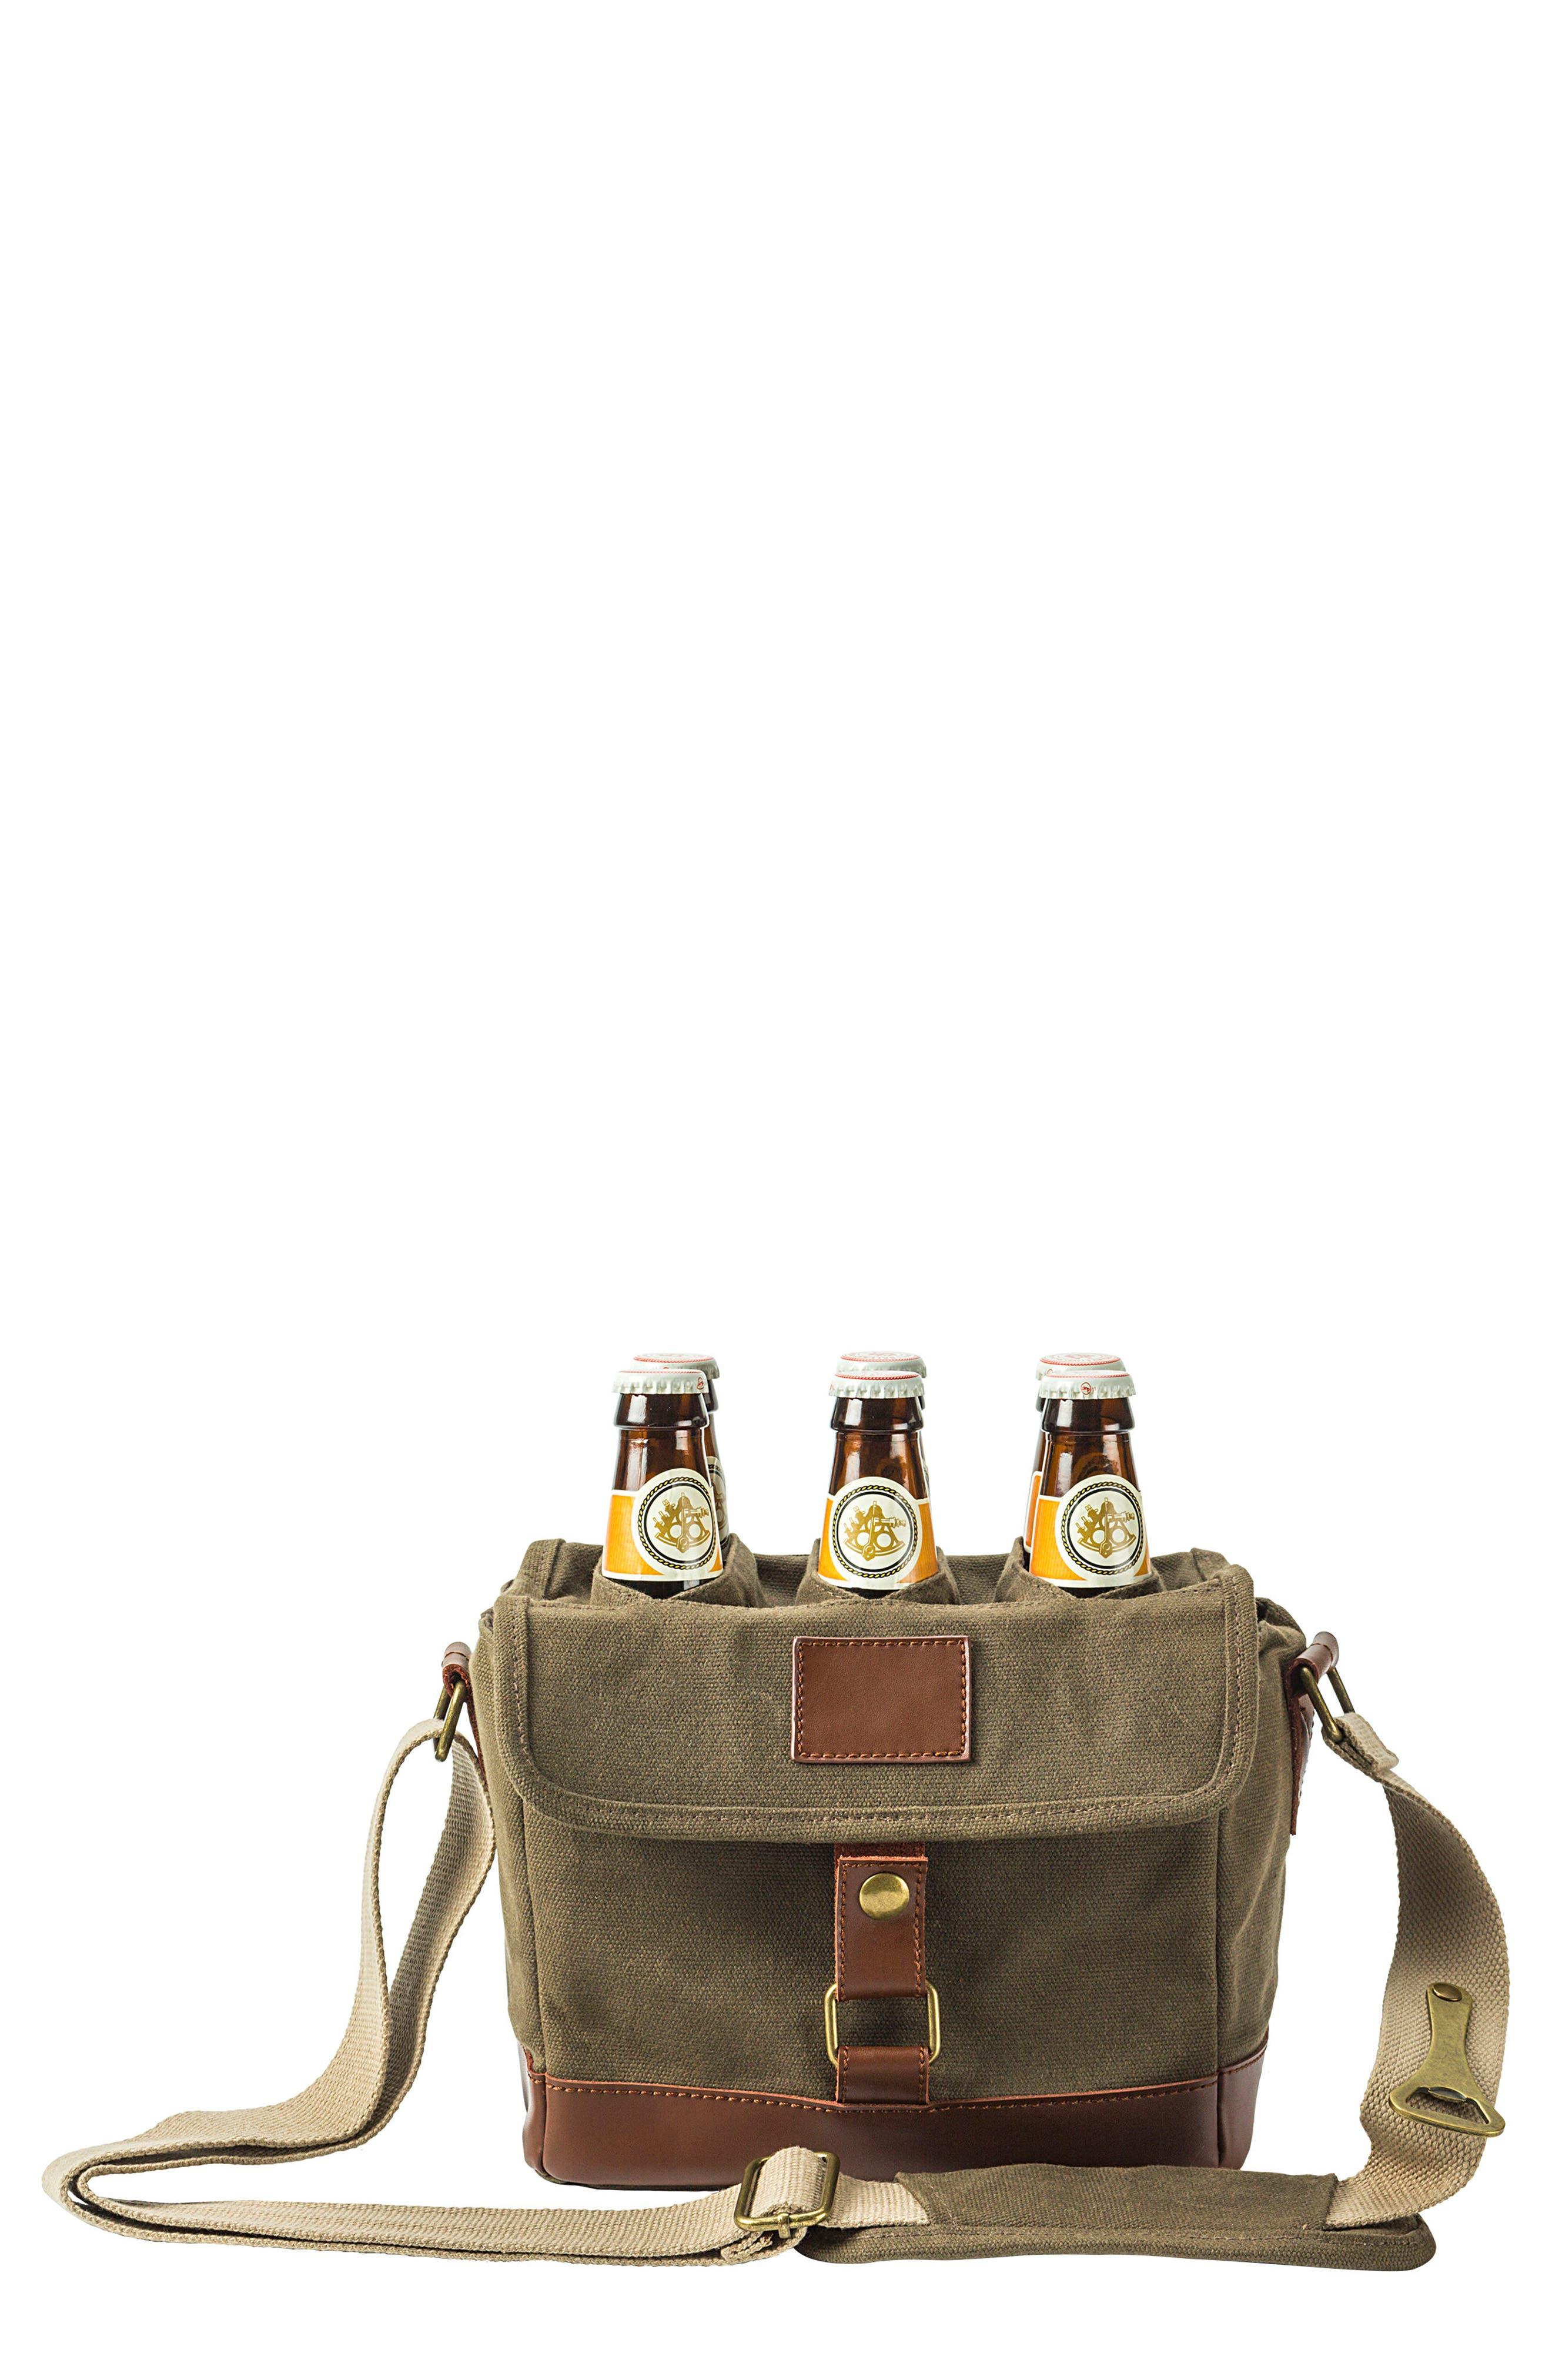 Alternate Image 1 Selected - Cathy's Concepts Monogram 6-Bottle Beer Cooler